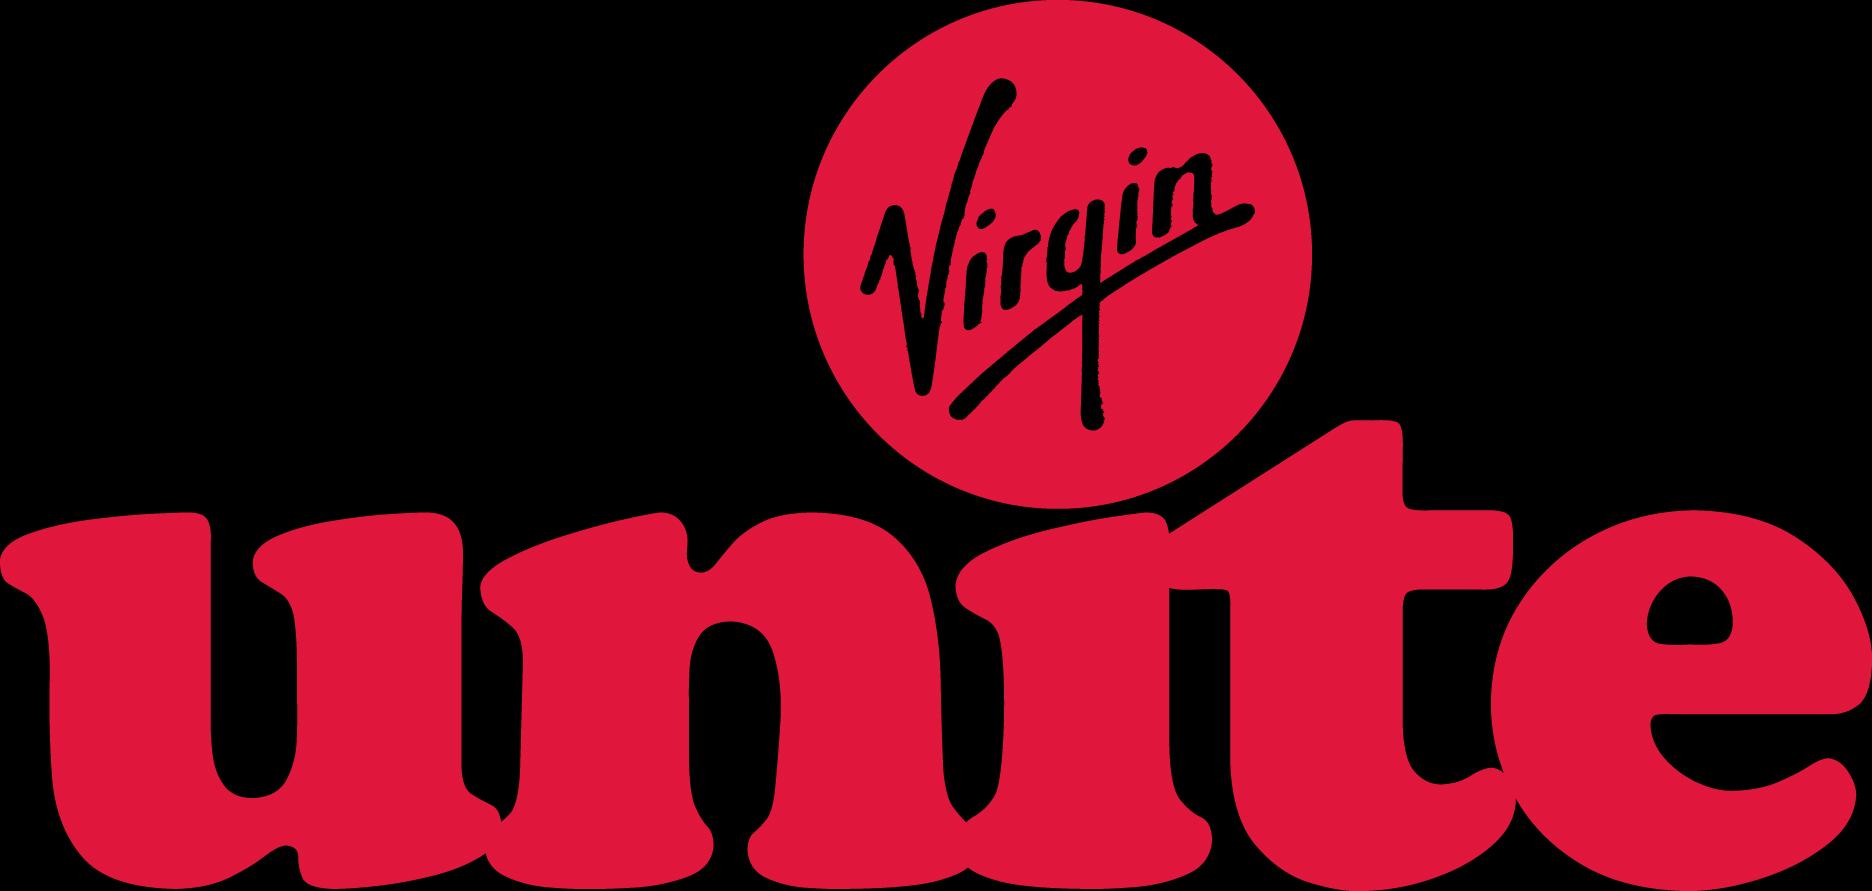 Virgin unite Logo Edited.jpg